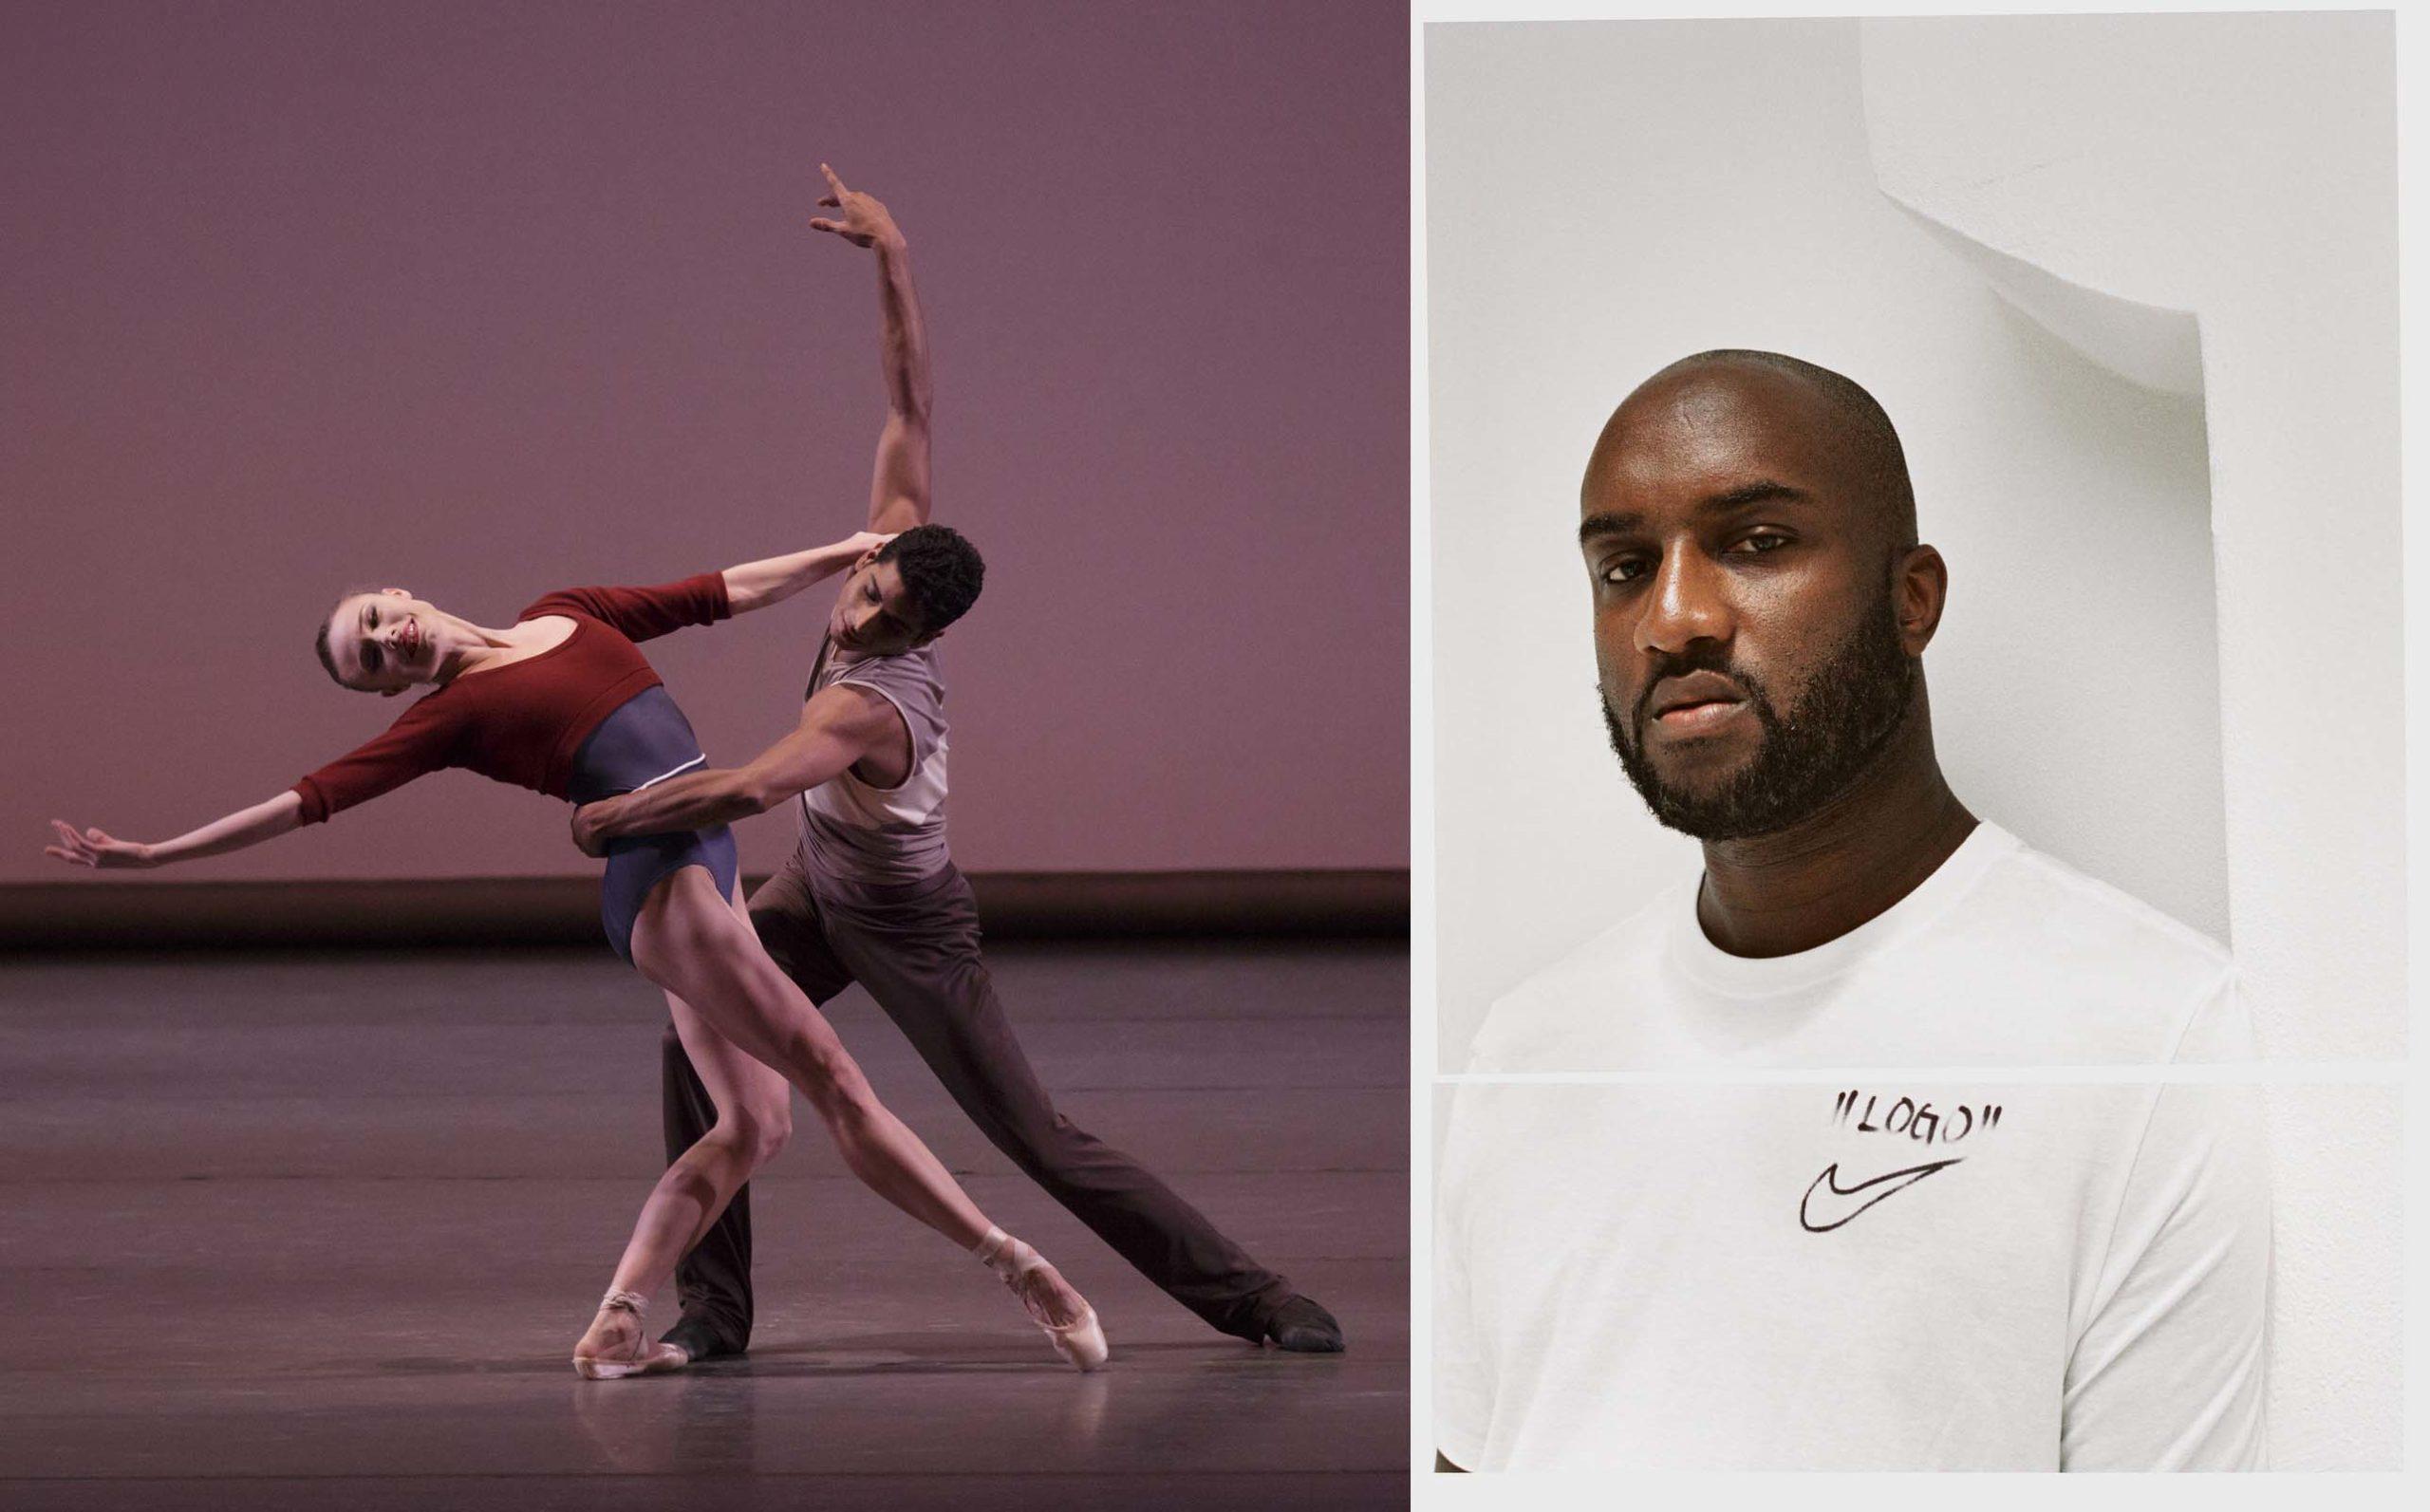 griot-mag-Il talento di Virgil -Abloh arriva al New York City Ballet-nike-the ten